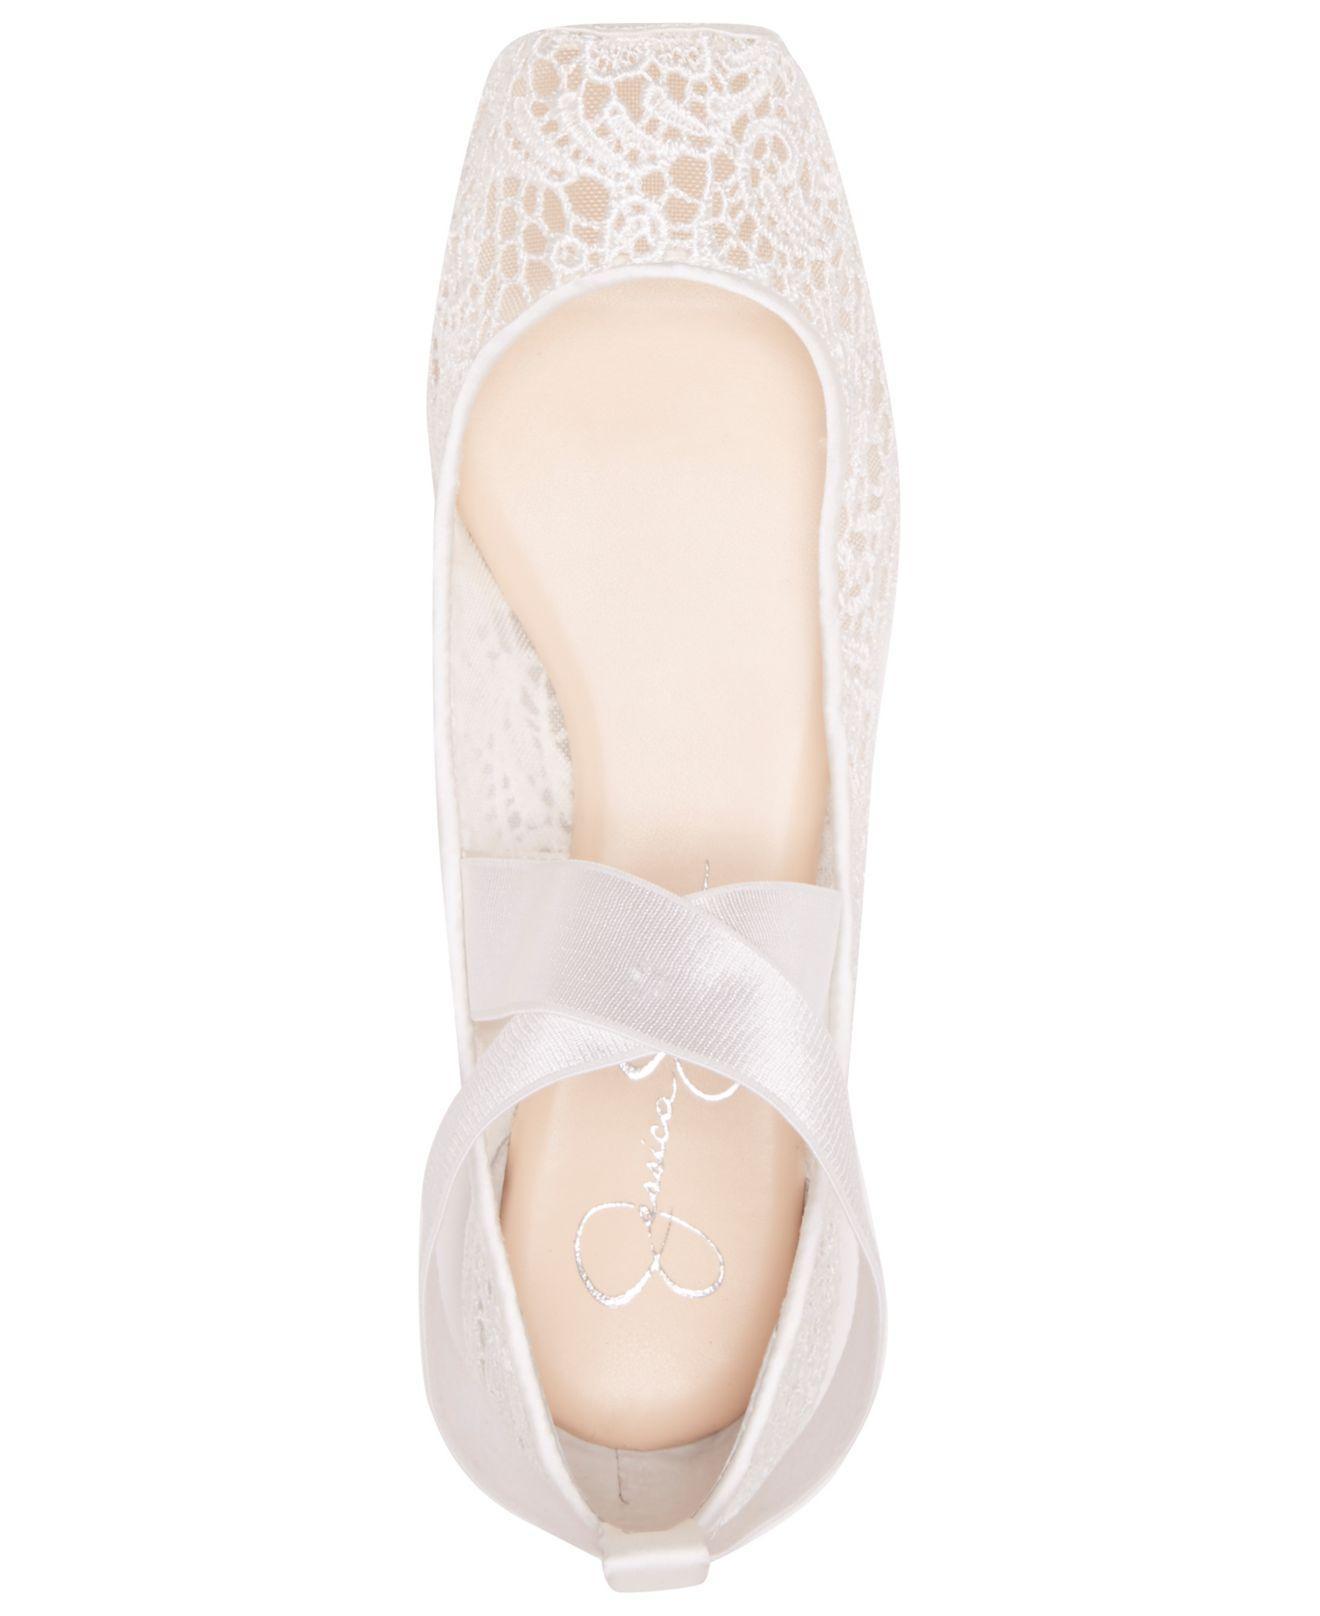 Jessica Simpson Lace Maggda Ballet Flat